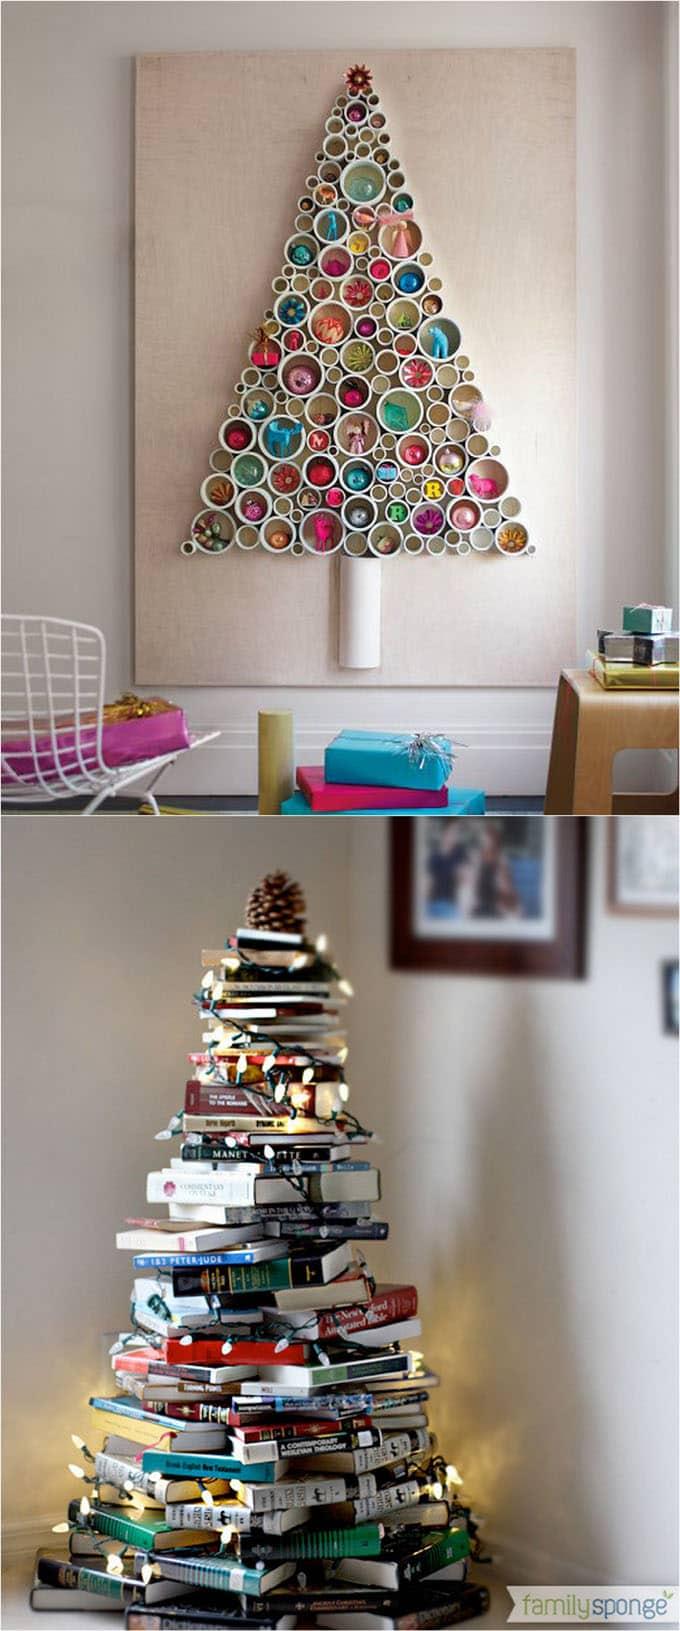 18 creative Christmas trees apieceofrainbow 1 - 42 Gorgeous Christmas Tree Decorating Ideas { & Best Tutorials!}